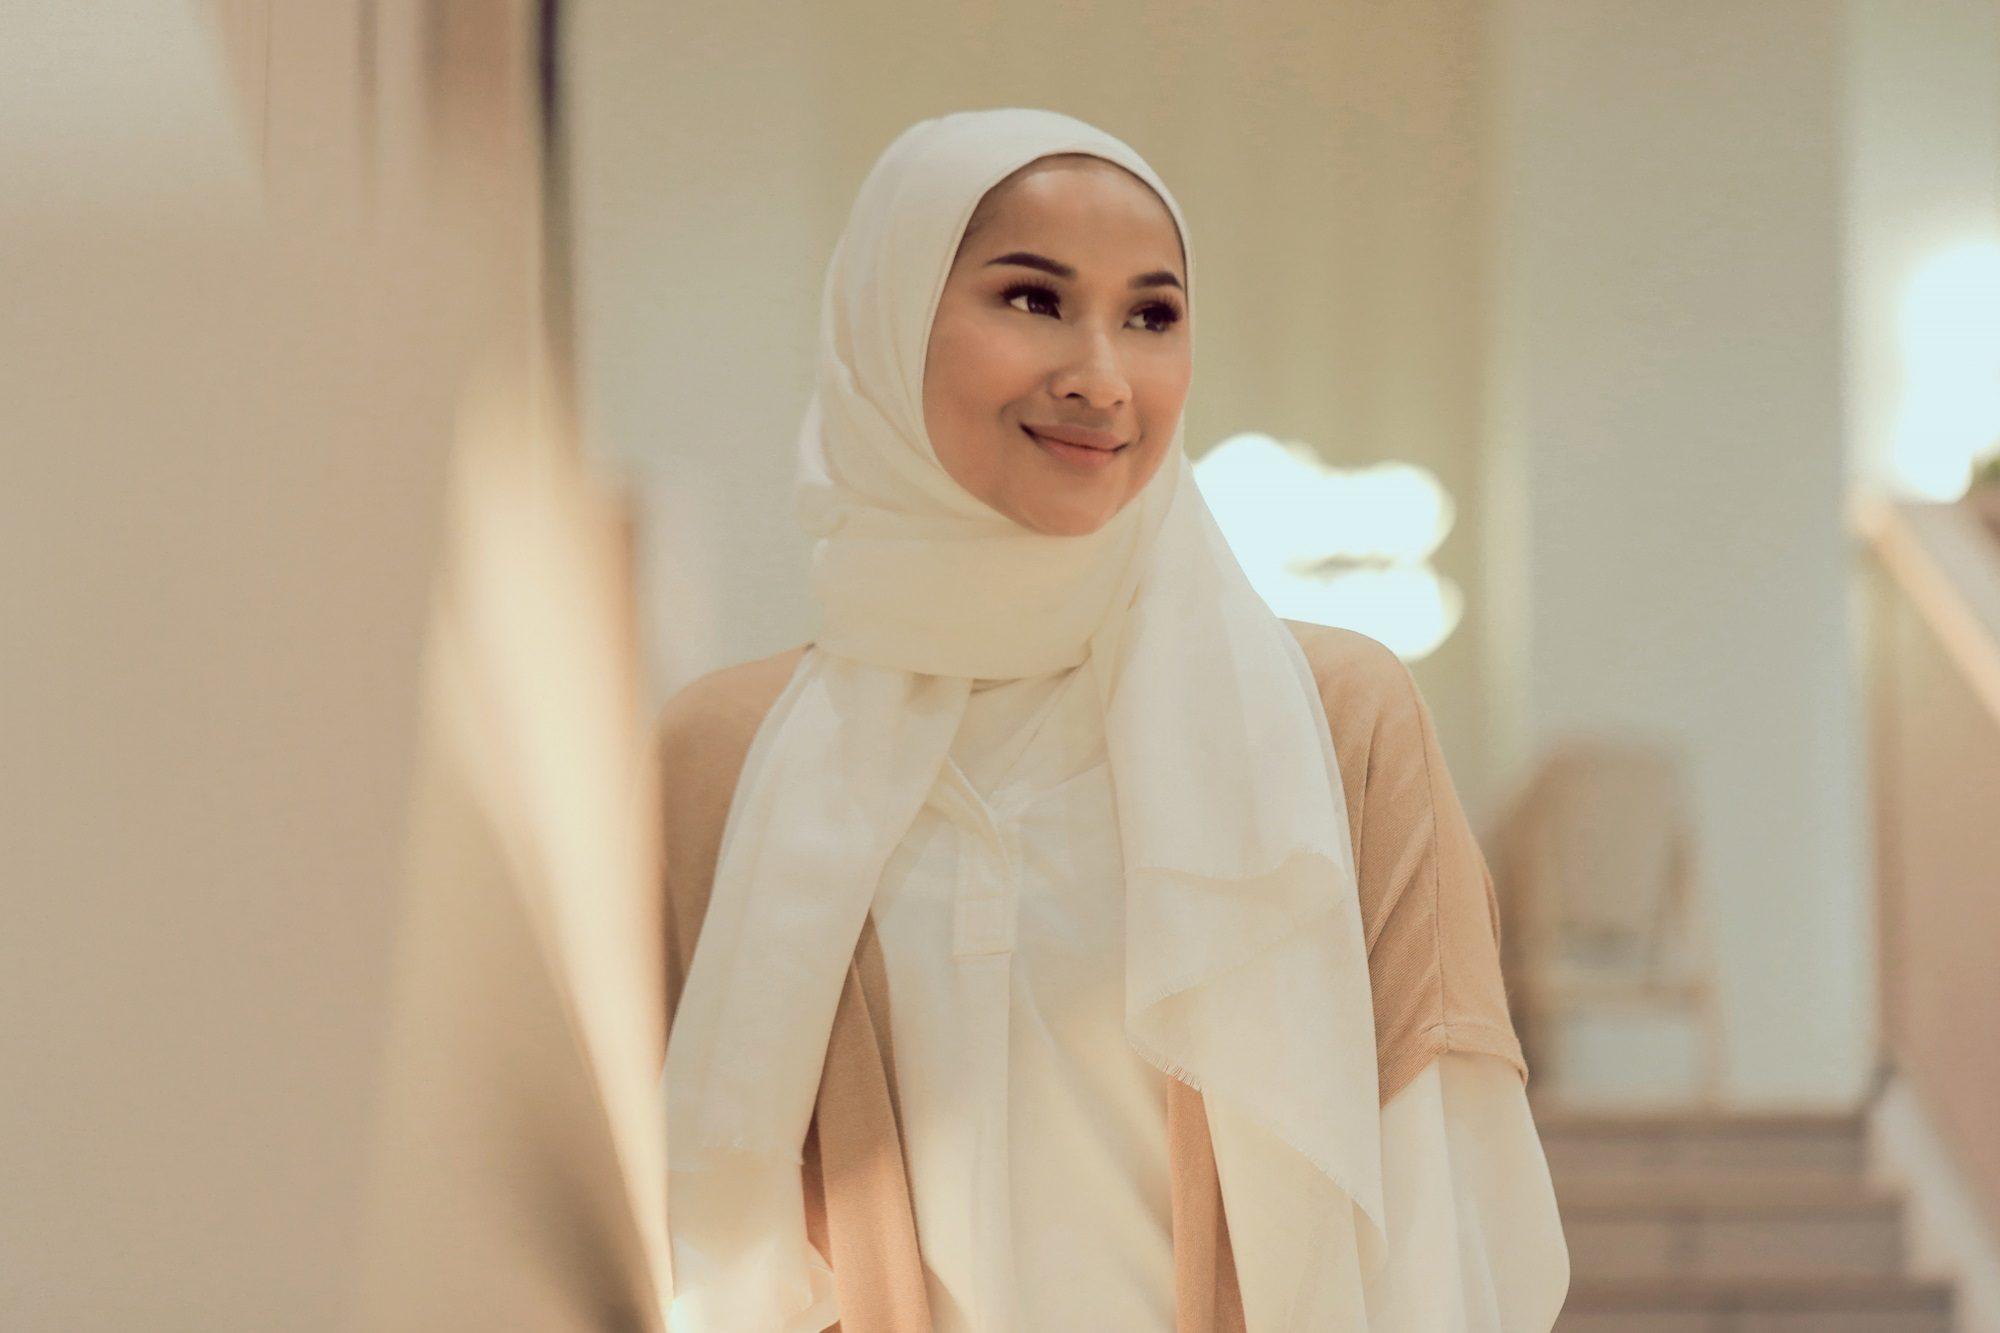 Wanita Asia memakai hijab pashmina bergaya semiformal berwarna putih